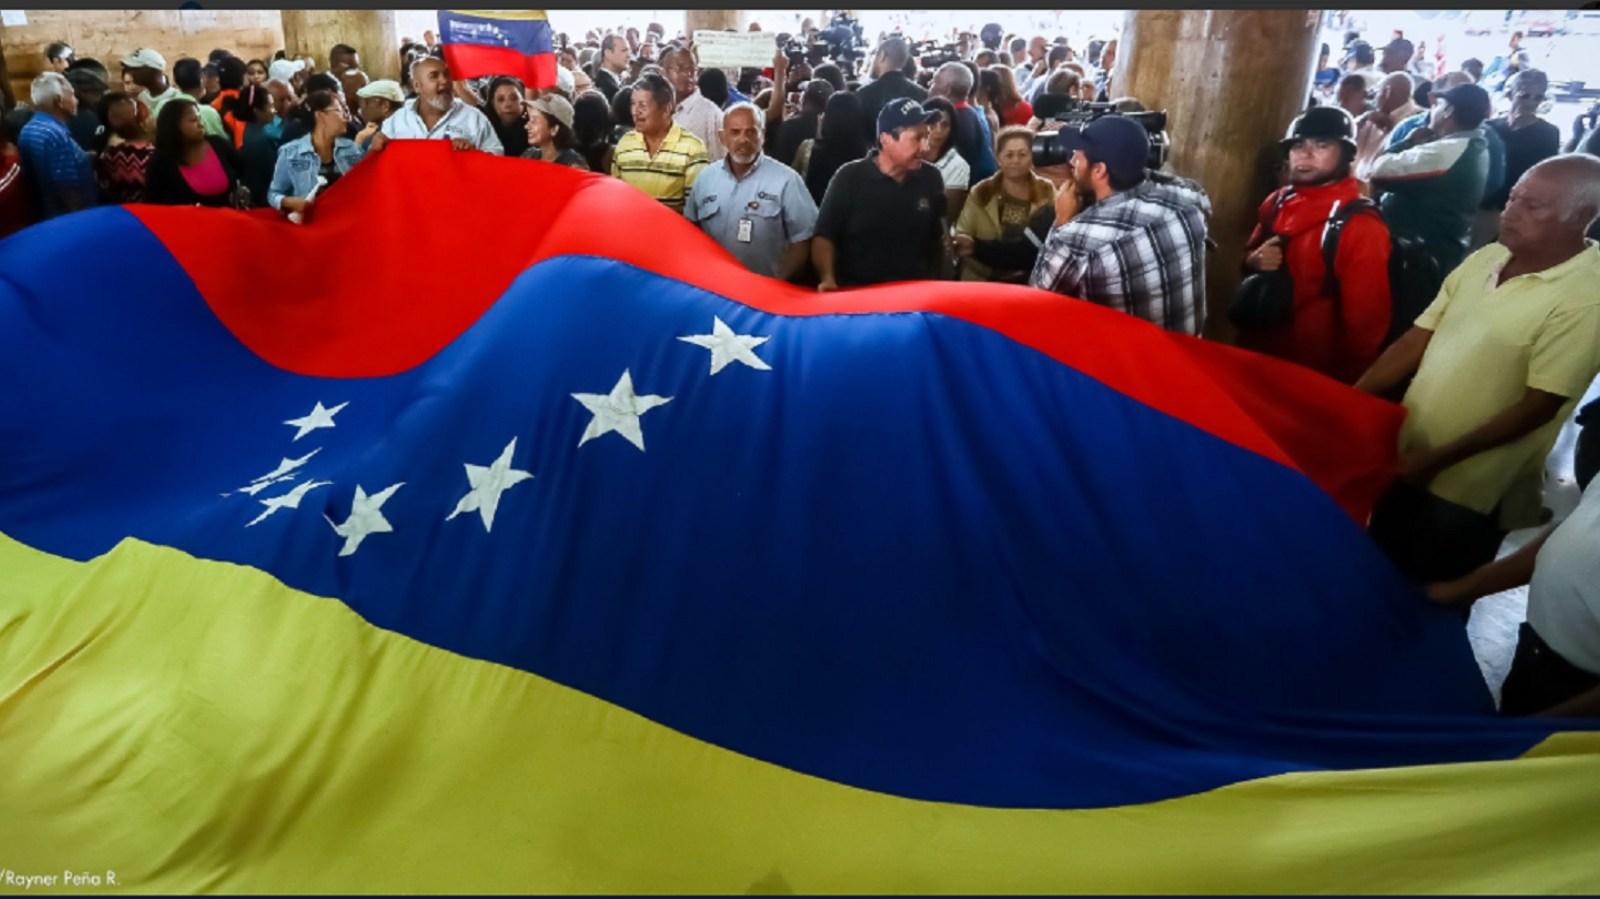 Parlamento venezolano pide a Bachelet interceder por diputados presos